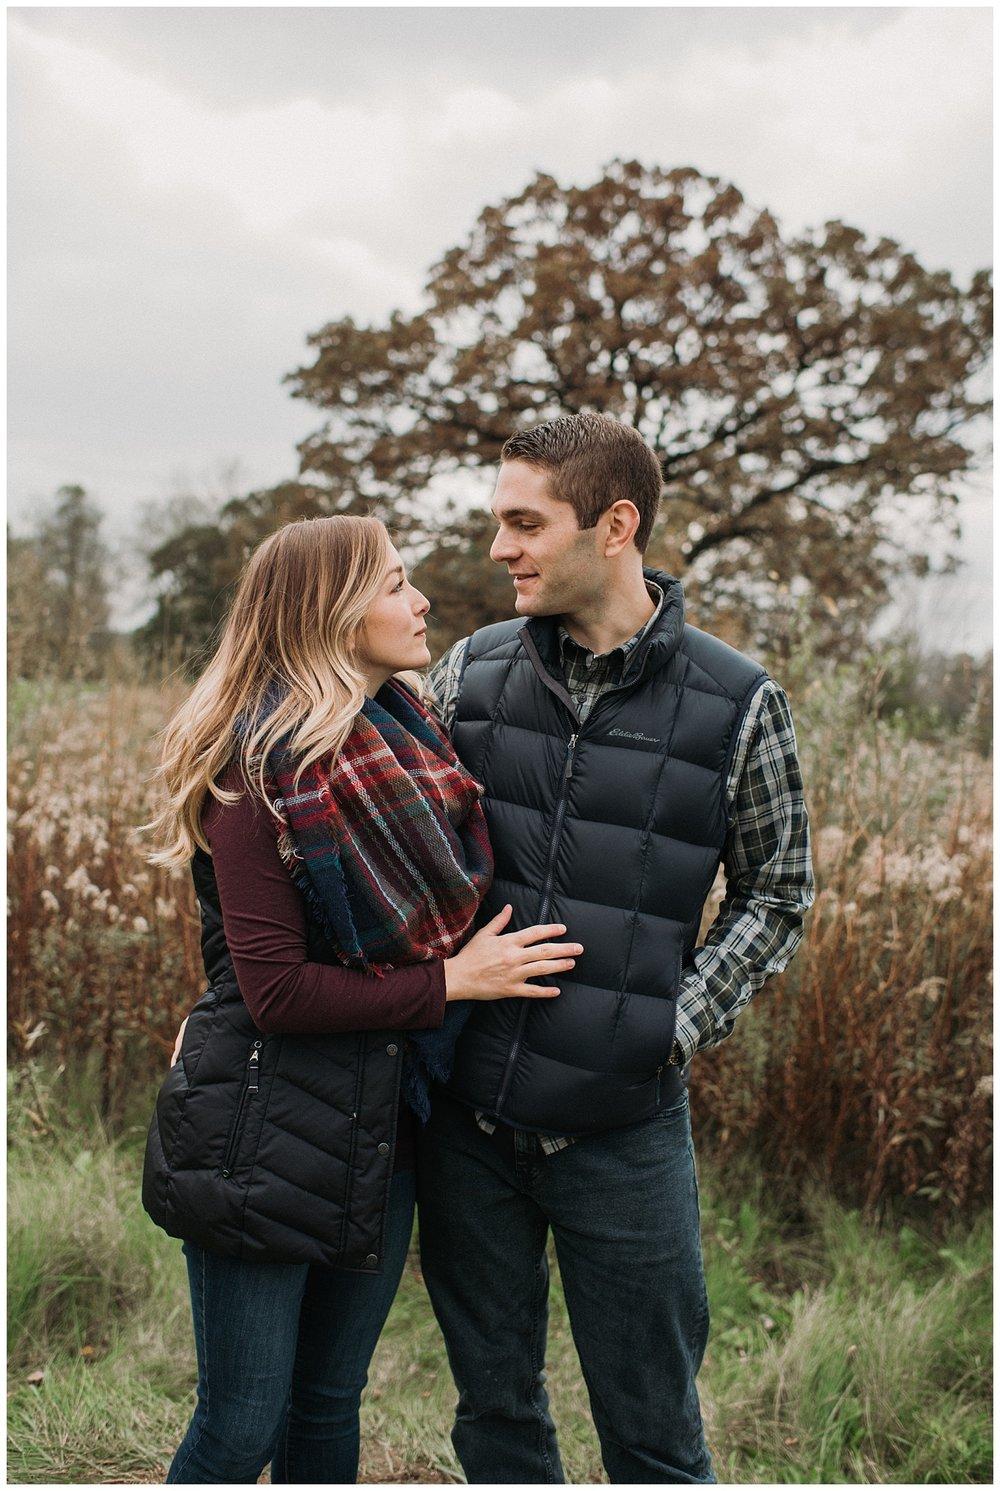 Wisconsin-family-photographer-2019 (7).jpg